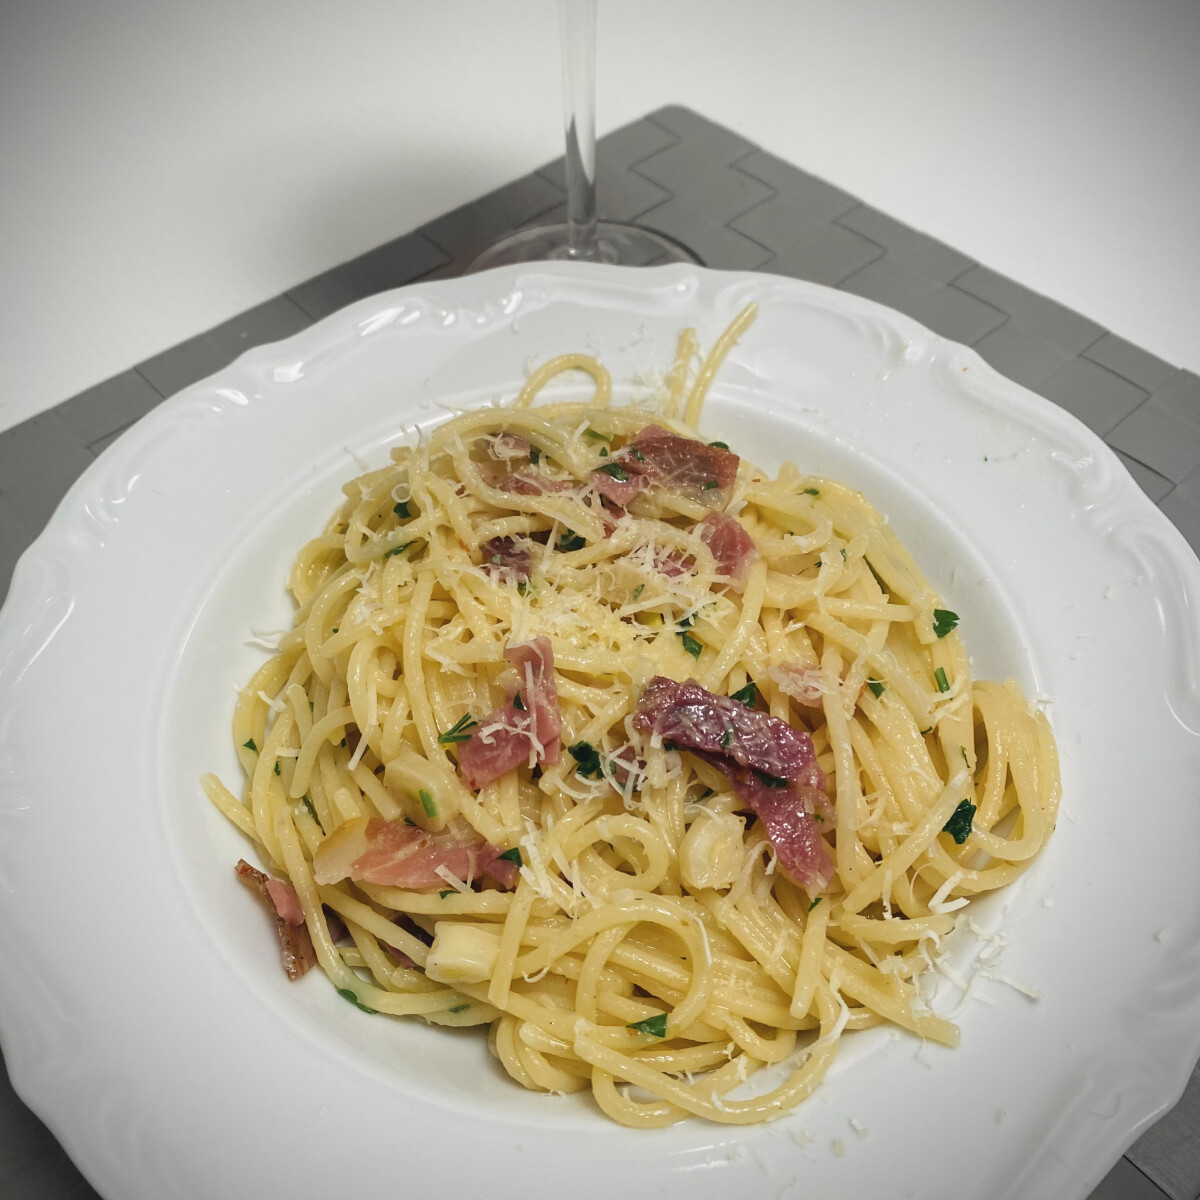 Fokhagymás-sonkás spagetti - Prosciutto e aglio